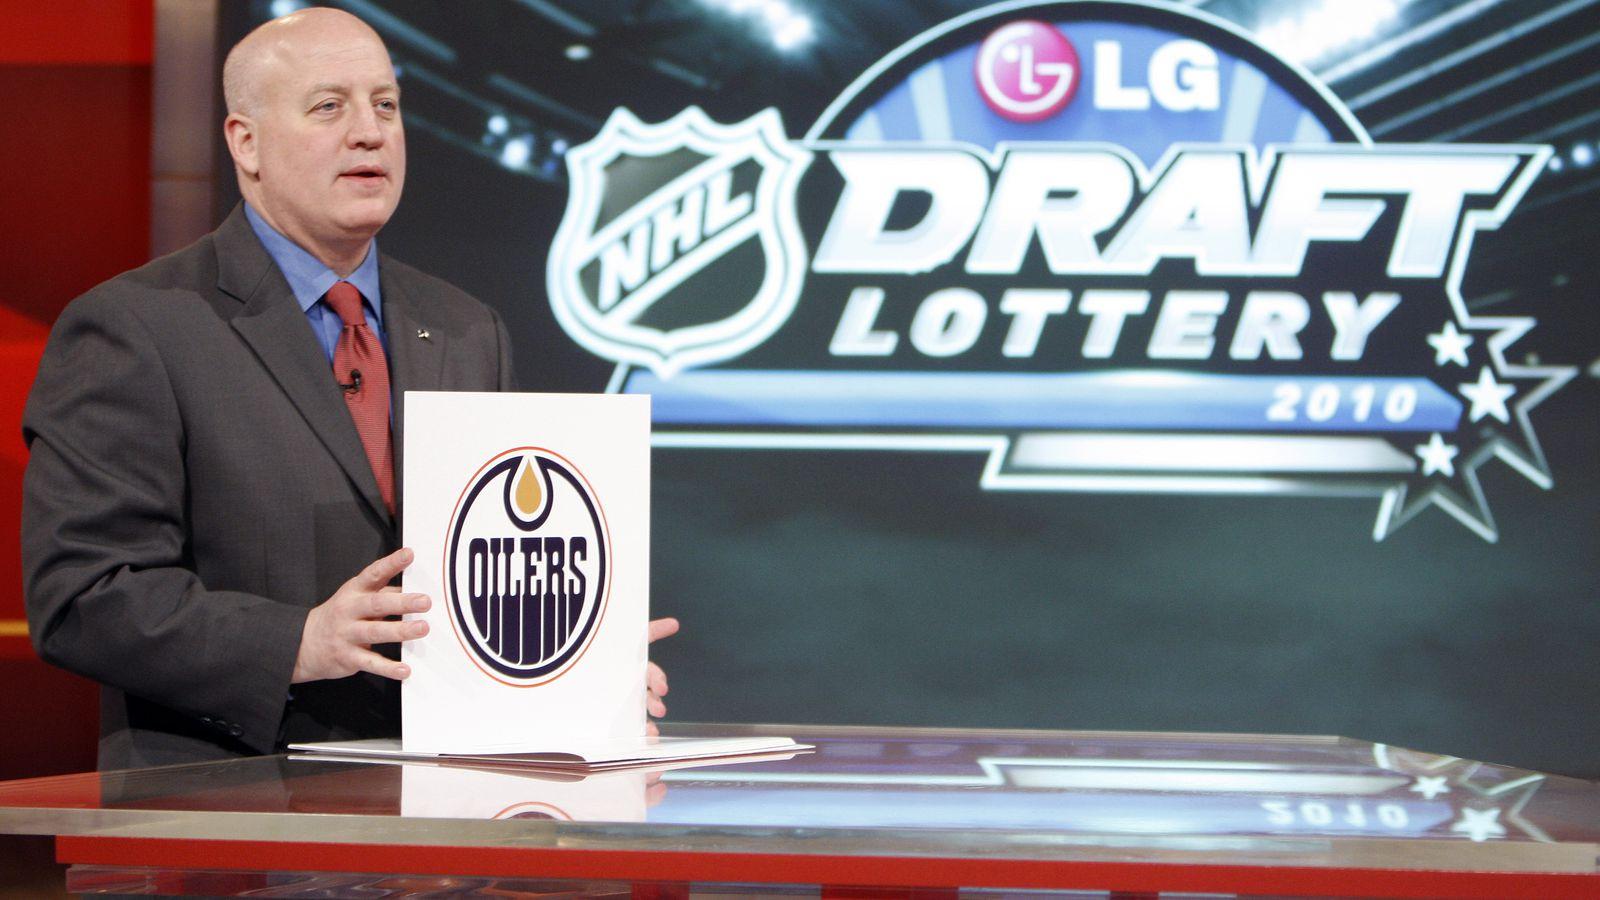 Nhl draft lottery date in Australia